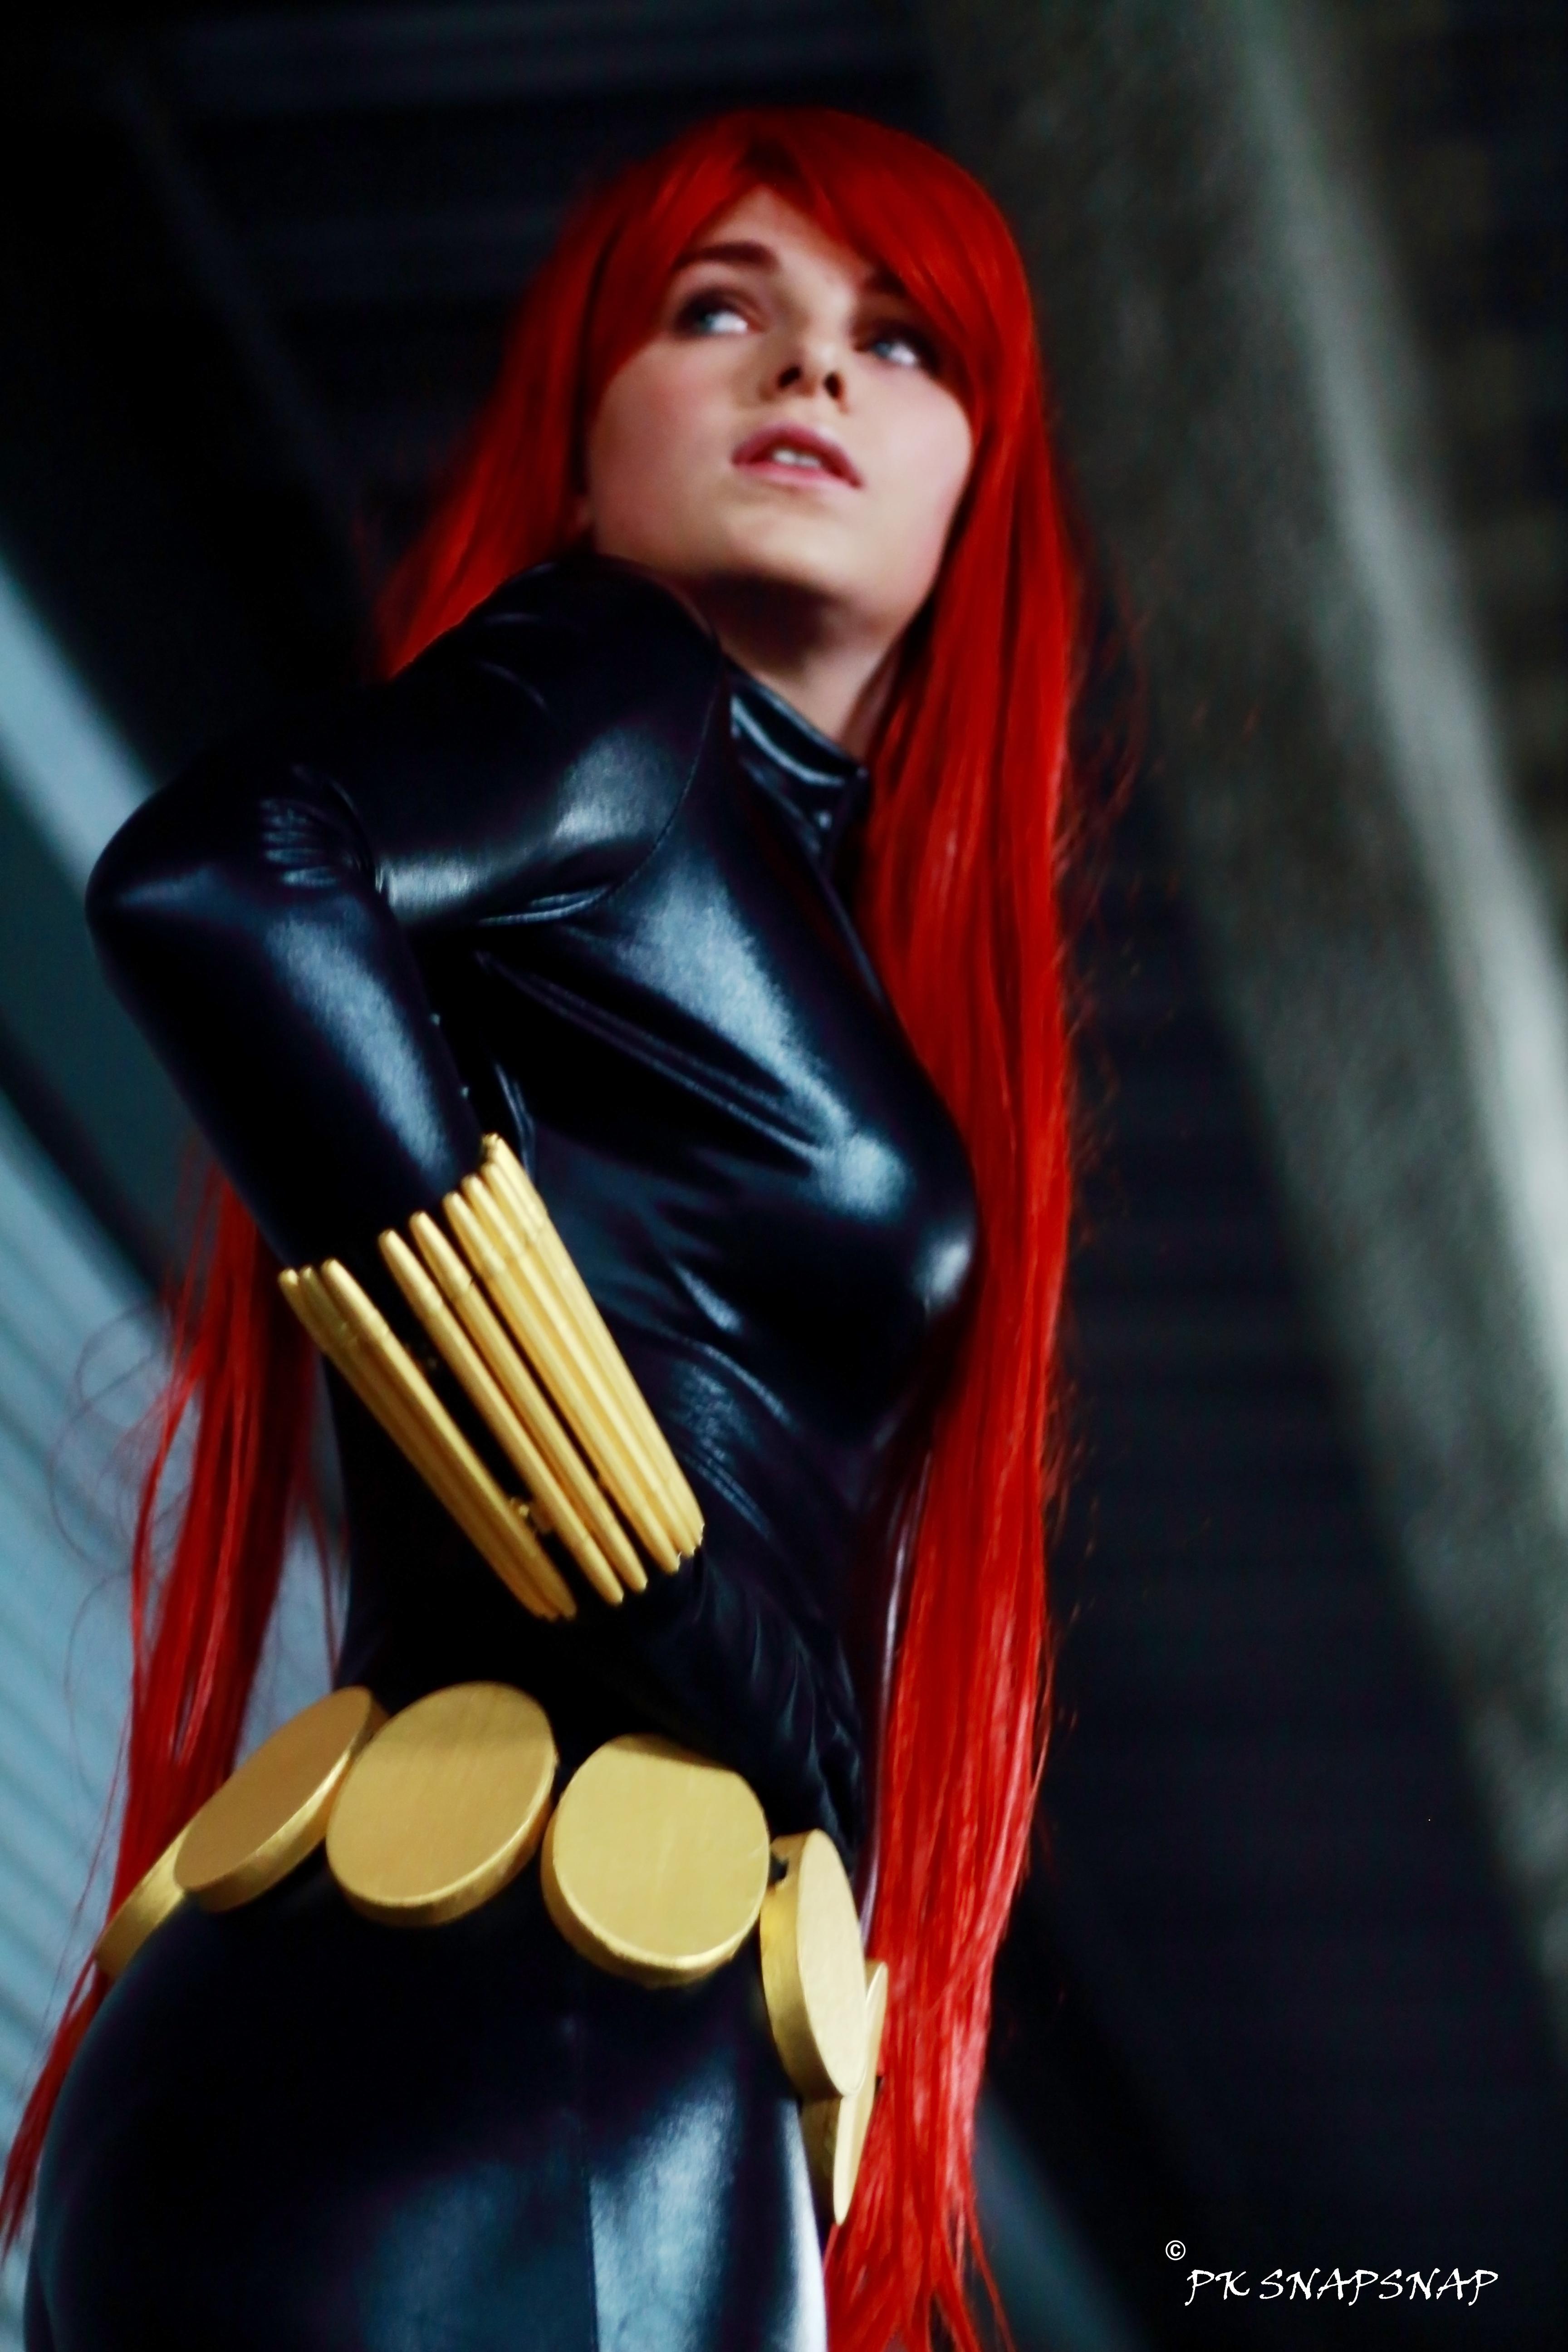 Pippa512 - Black Widow 01 by Mr-PKSnapSnap4078